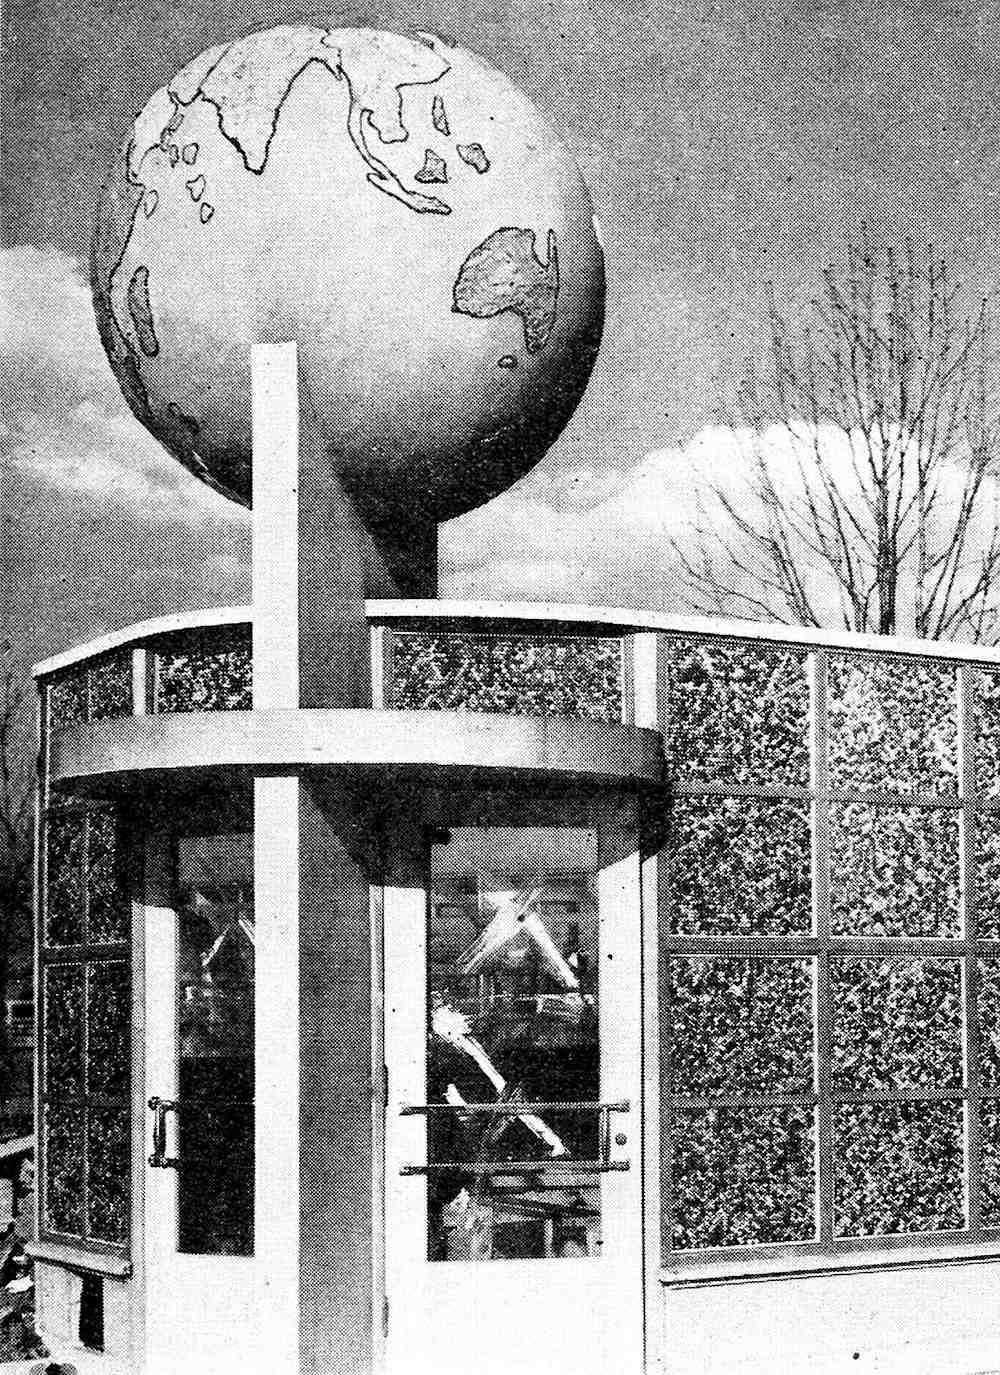 Earth entrance, world entrance, 1933 Chicago Worlds Fair